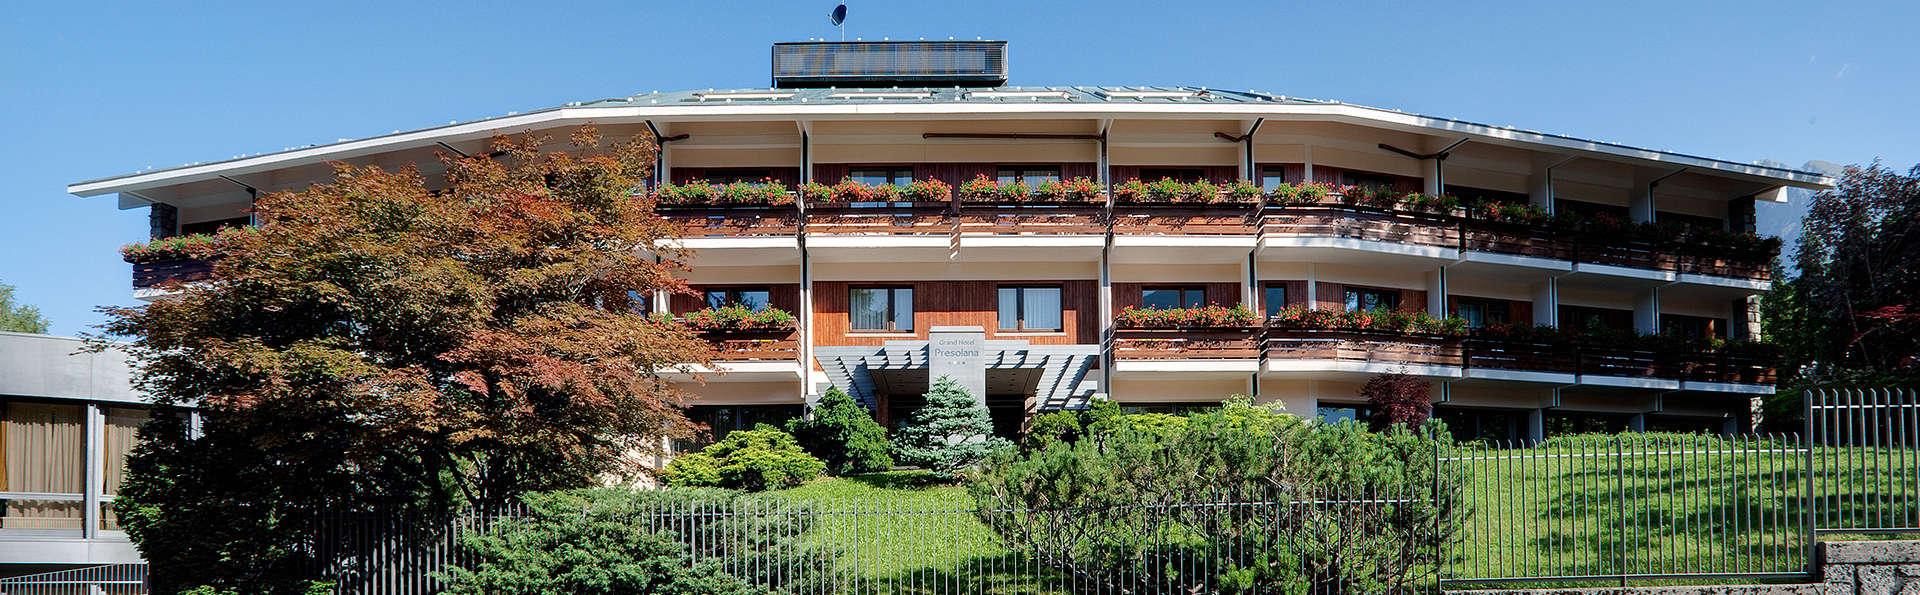 Grand Hotel Presolana - EDIT_front2.jpg